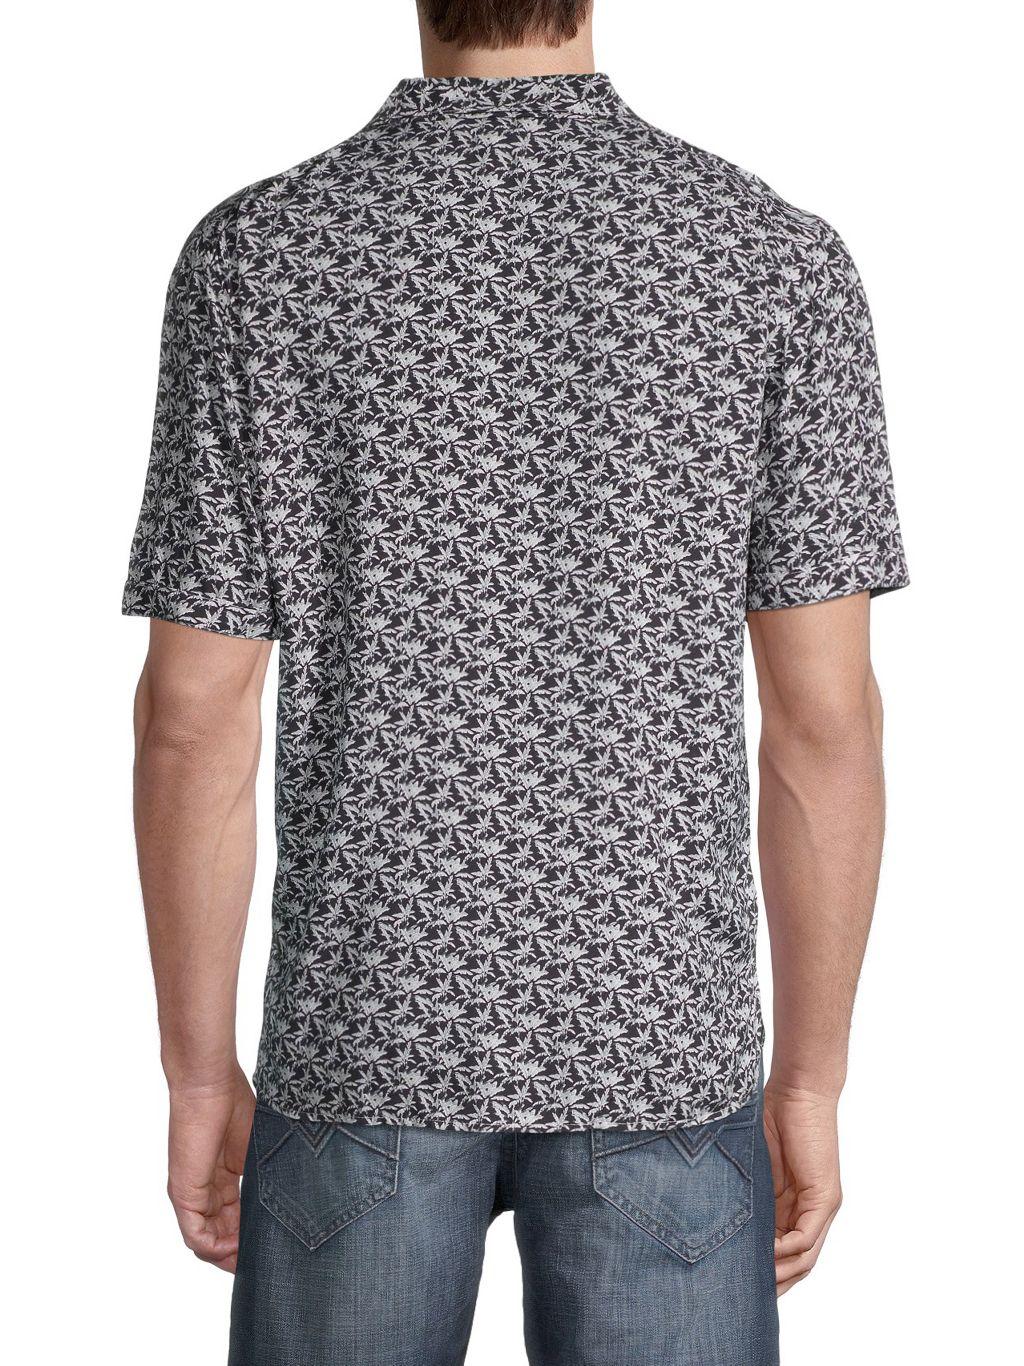 Eleven Paris Printed Short-Sleeve Shirt